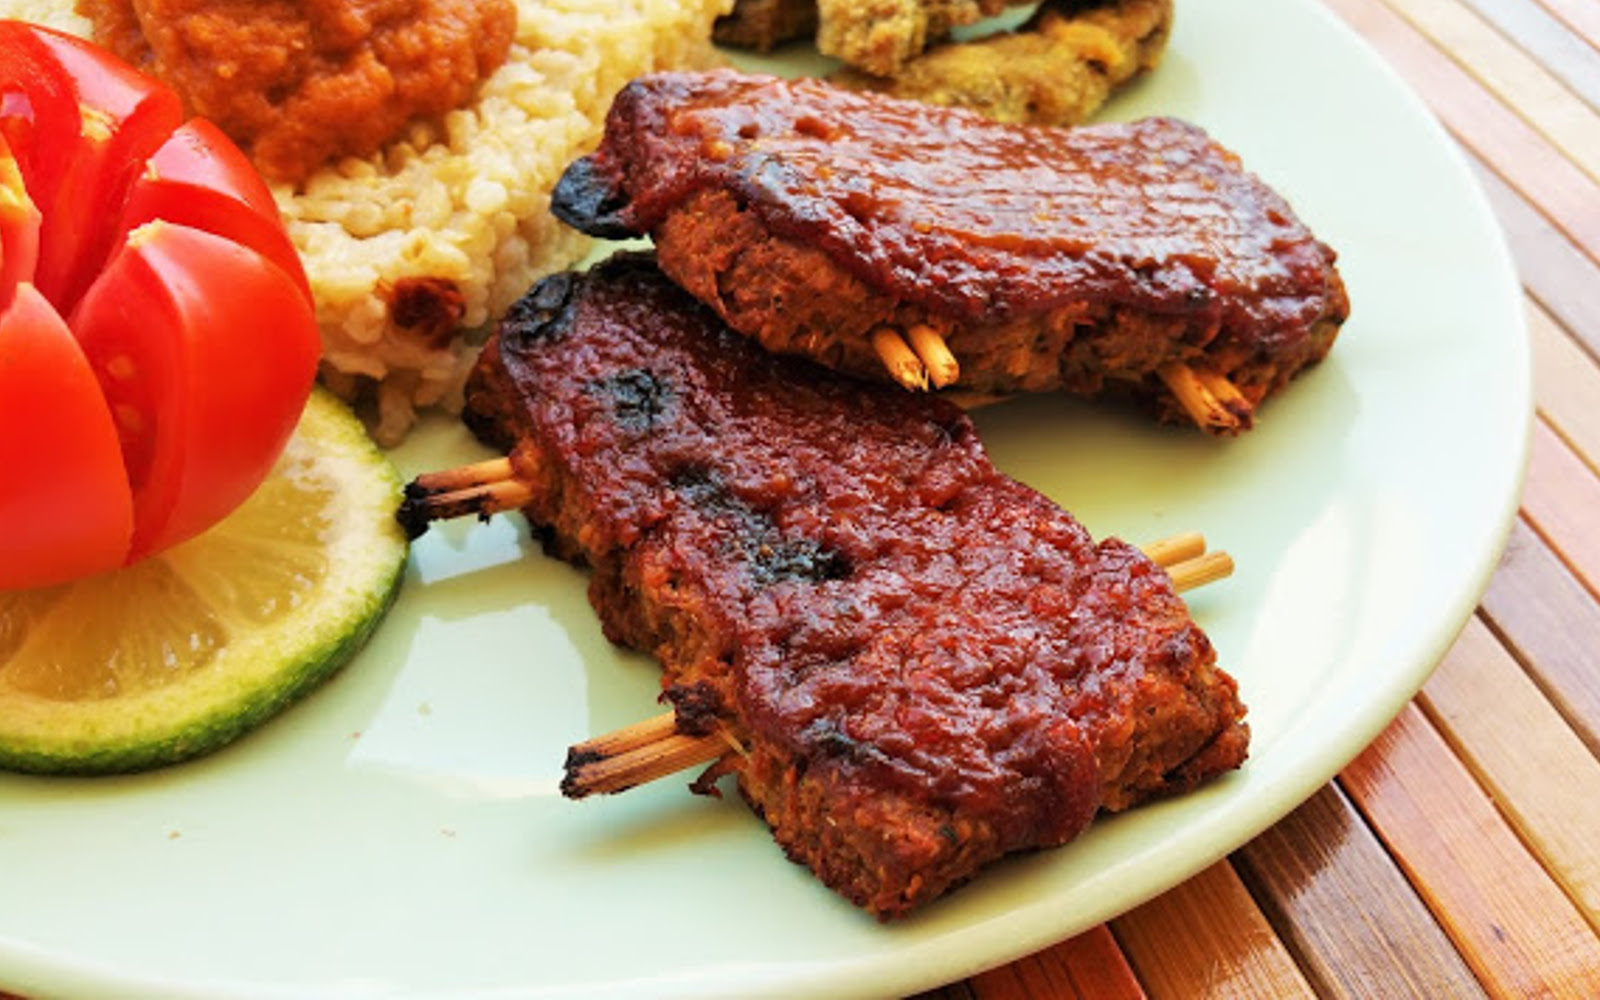 Barbecue 'Ribs'